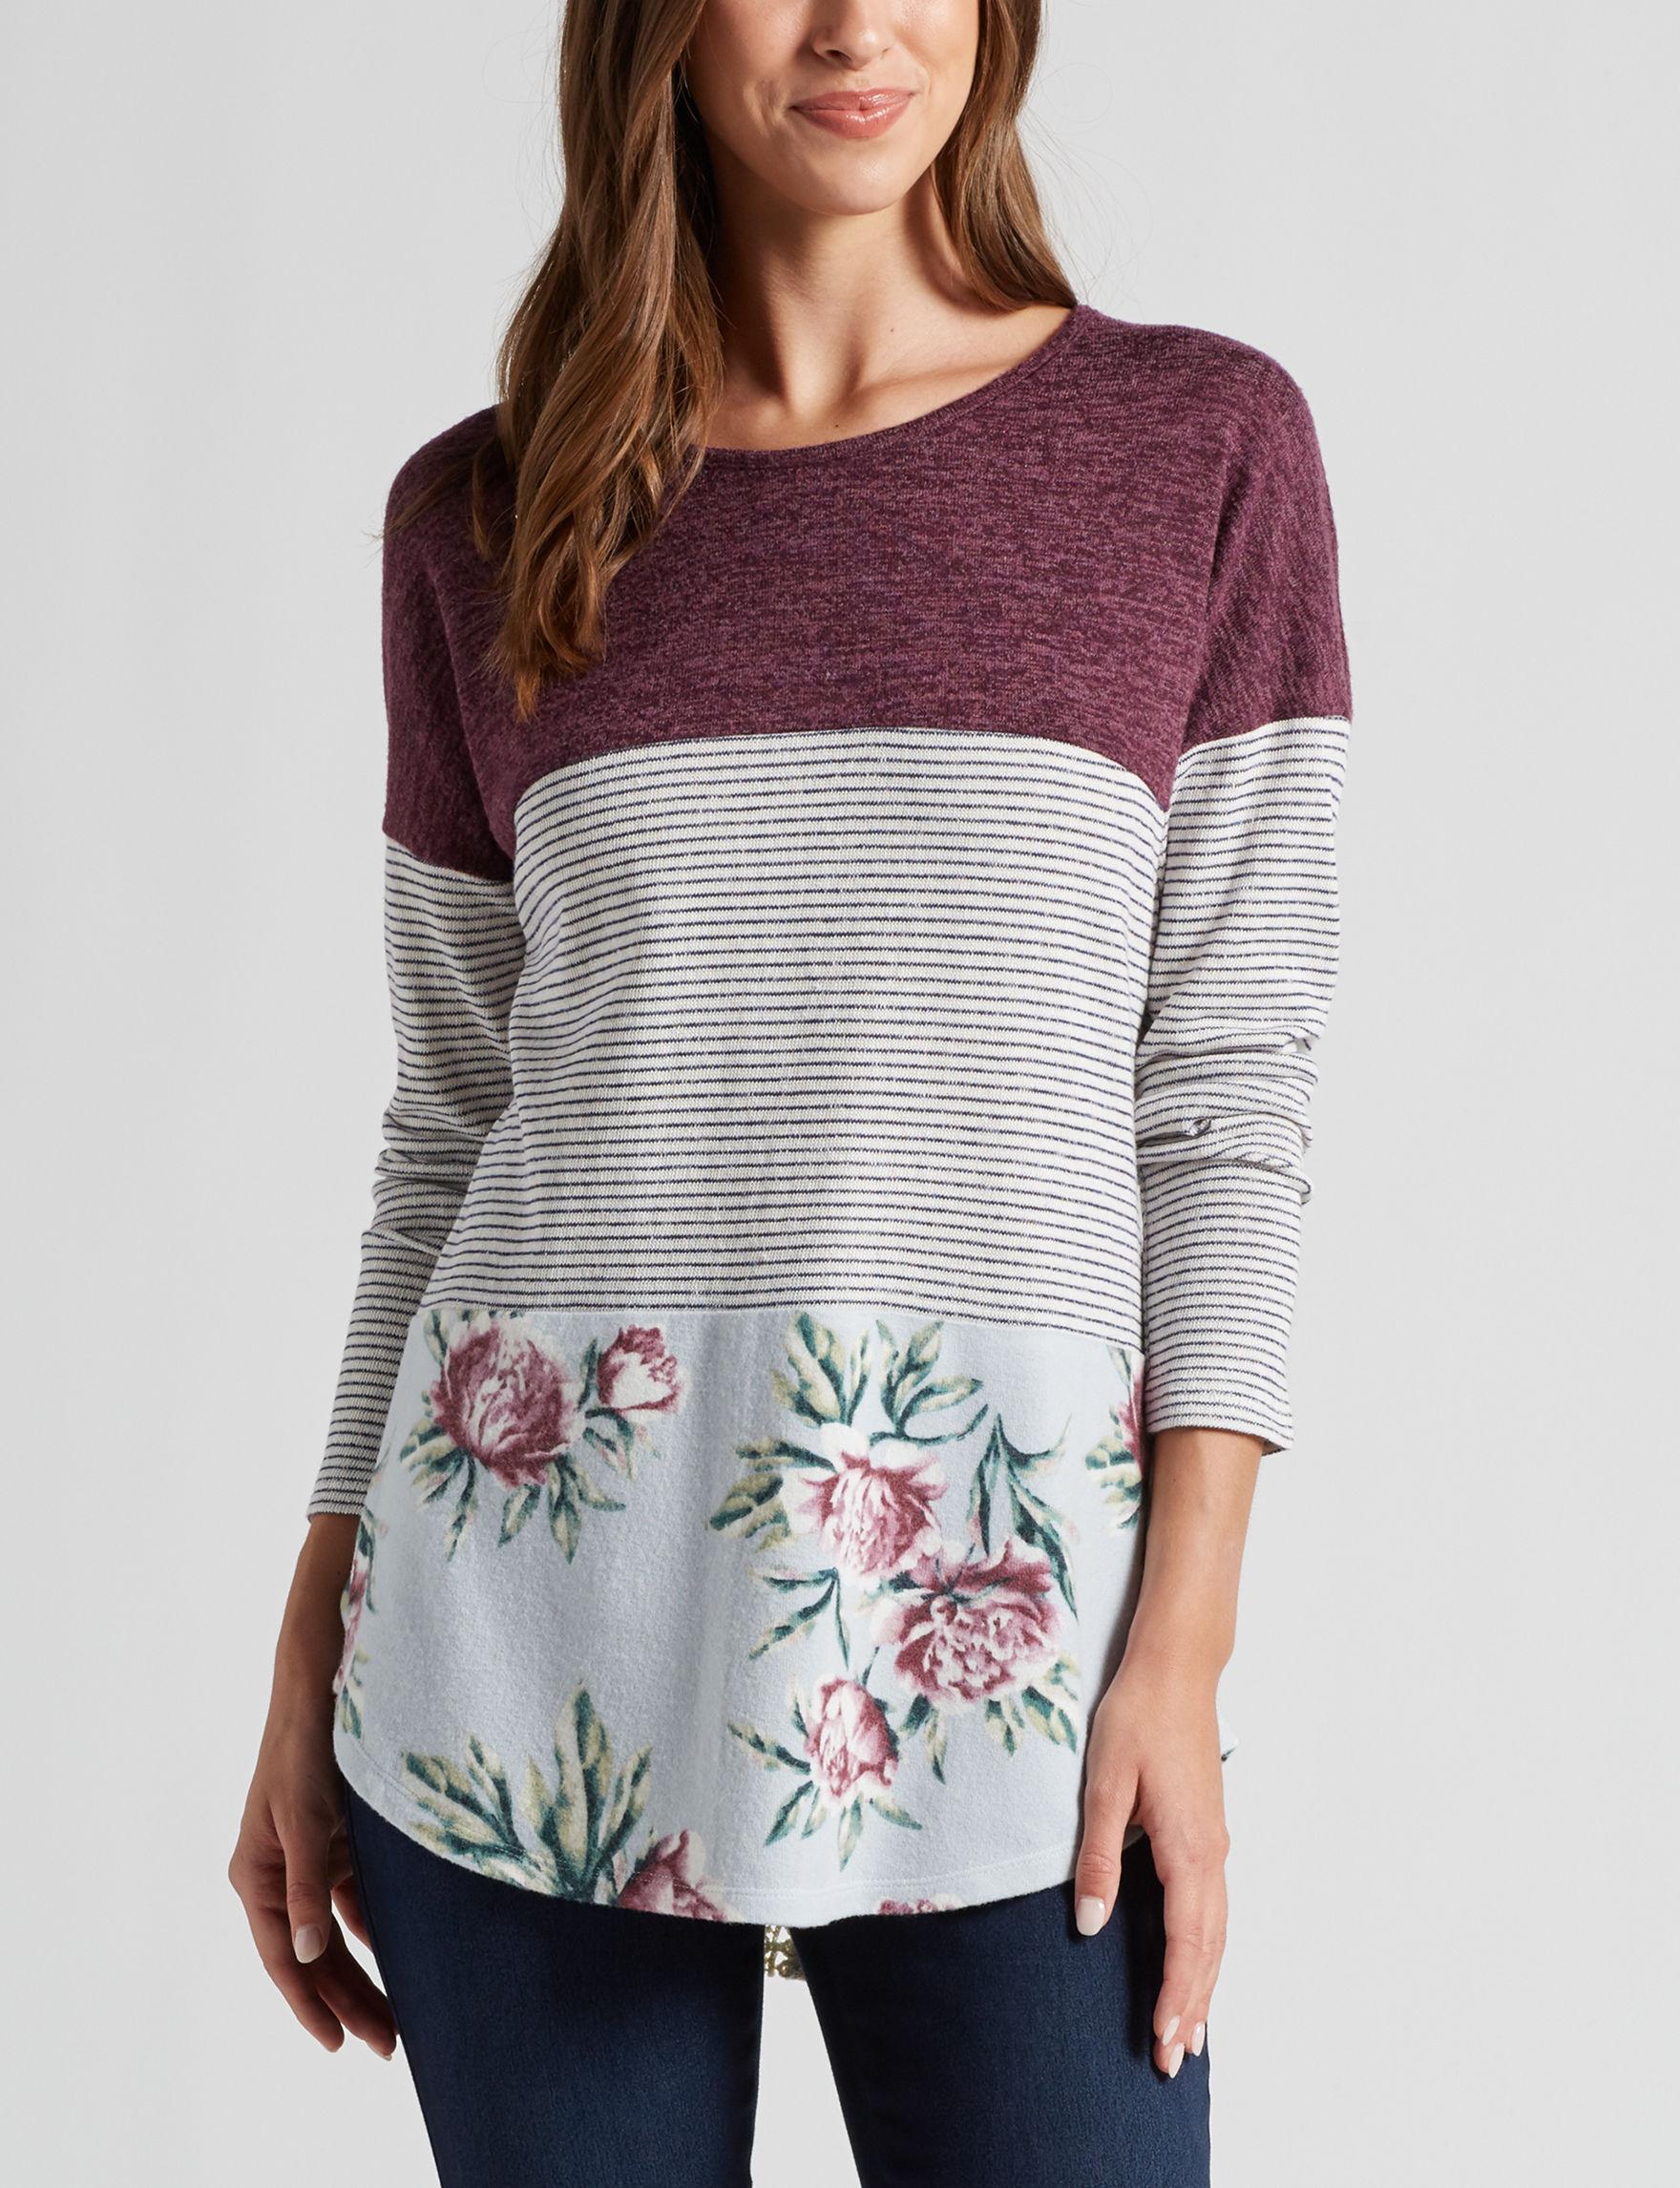 Signature Studio Purple Multi Shirts & Blouses